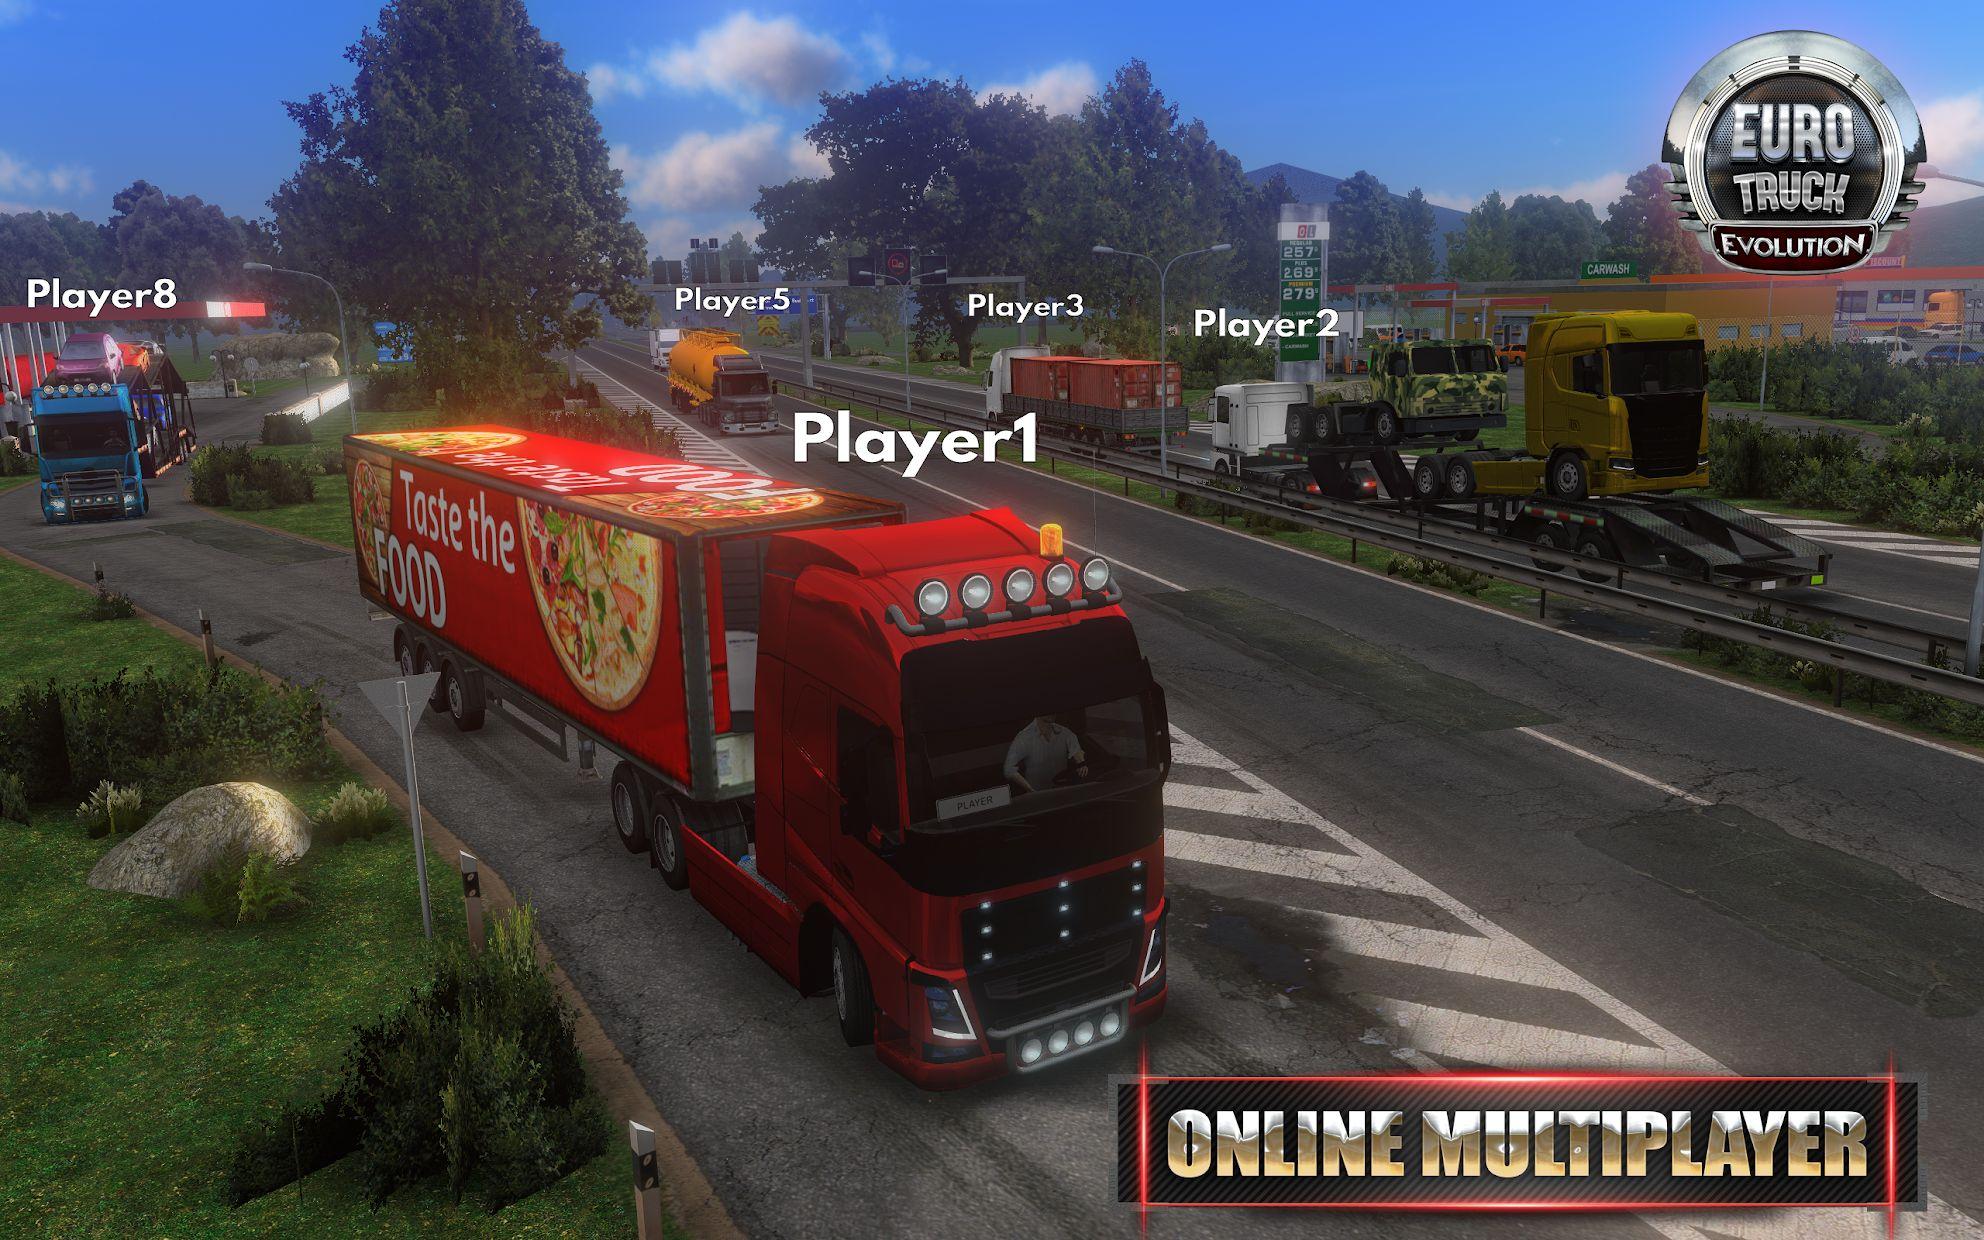 Euro Truck Evolution (Simulator) 游戏截图3